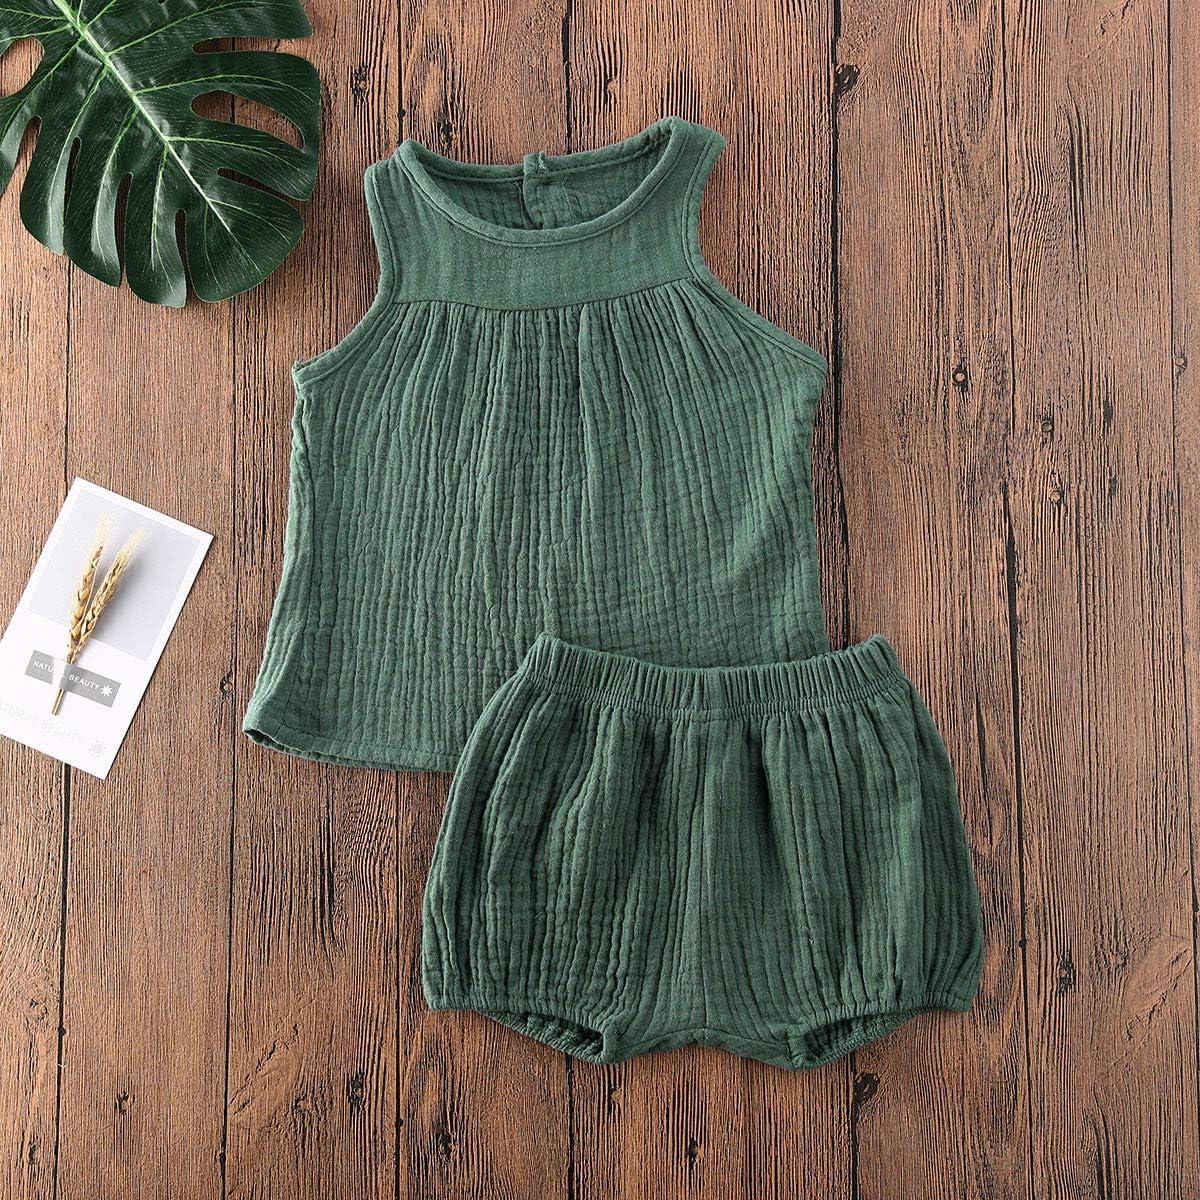 Blotona Toddler Girl Boy Summer Cotton Linen Outfits Sleeveless Top Basic Plain Shorts Sets